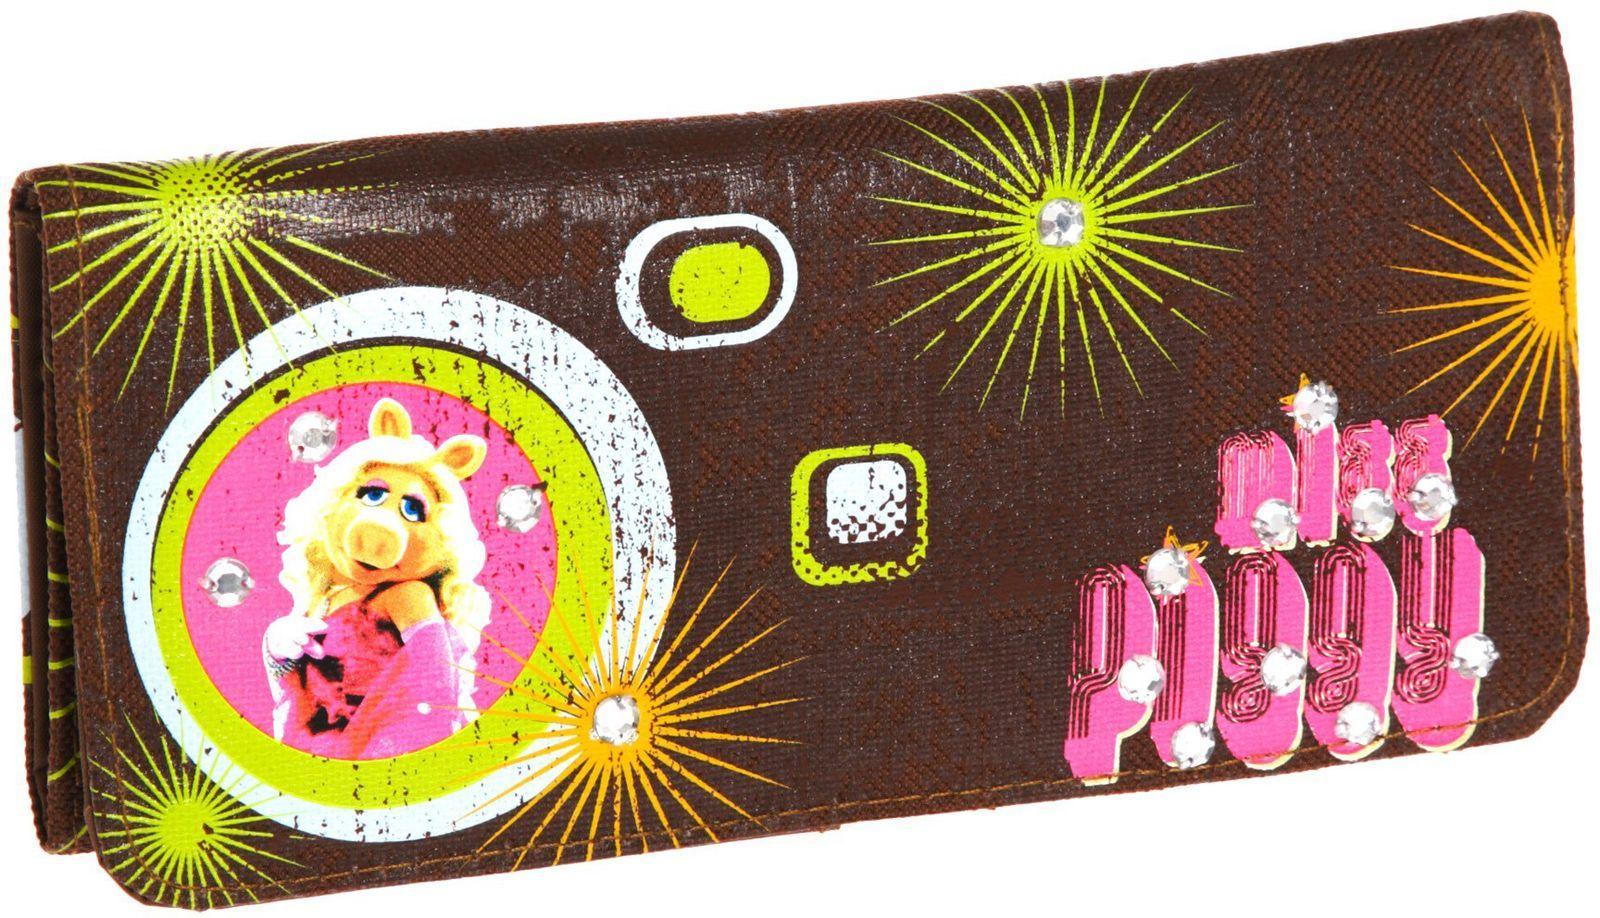 882fbd898f Muppet Show Πορτοφόλι 31-70286